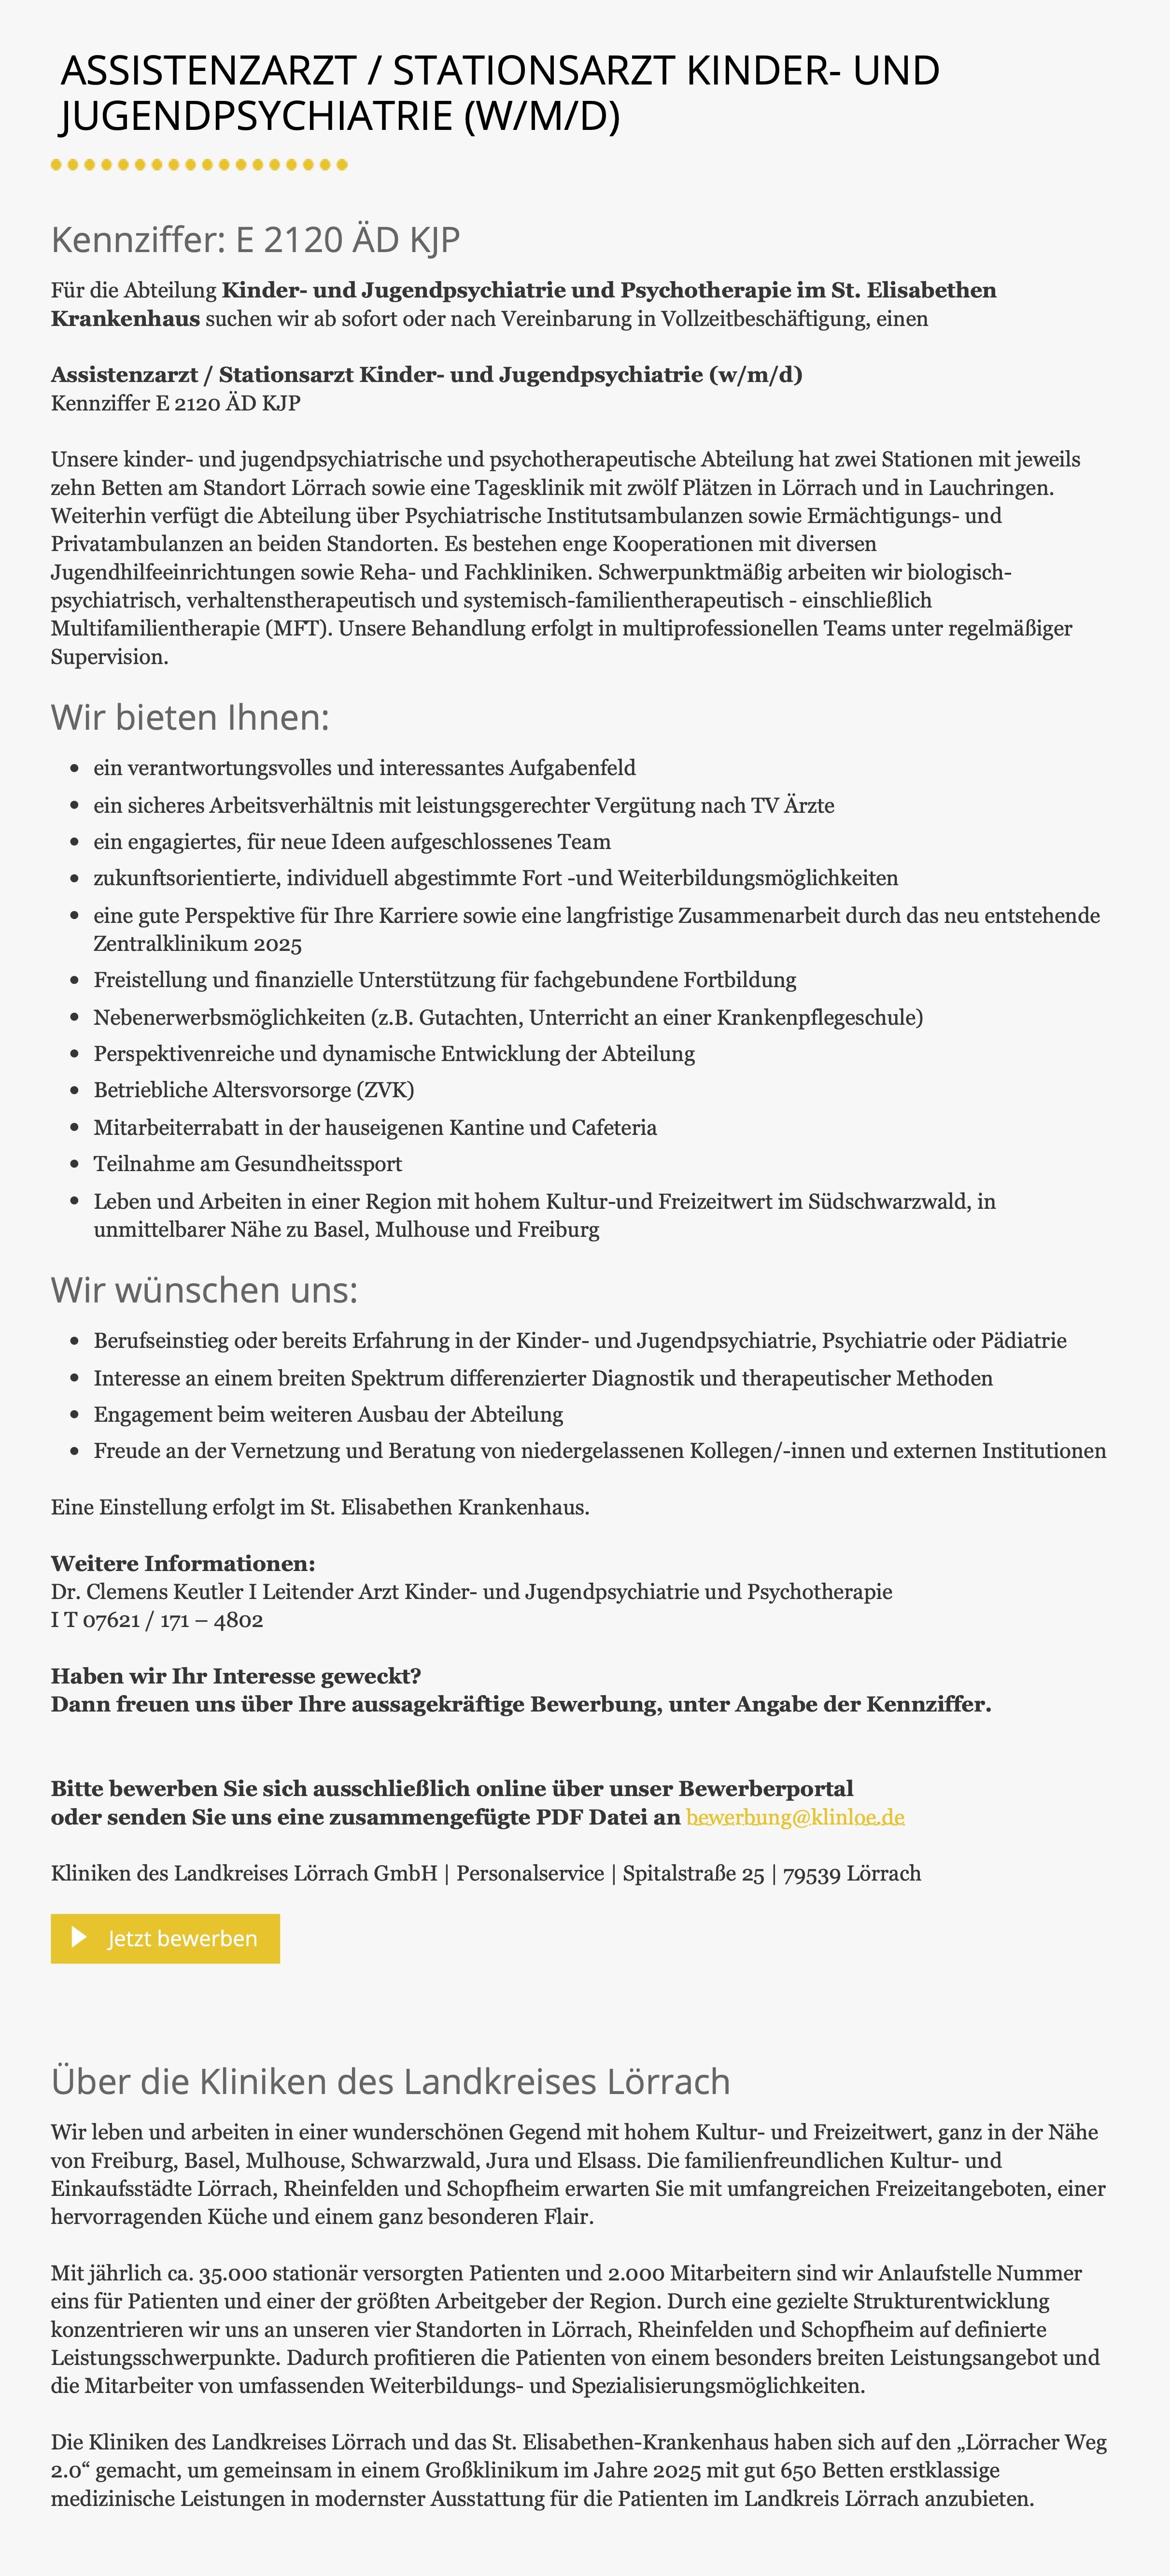 Assistenzarzt / Stationsarzt Kinder- und Jugendpsychiatrie (w/m/d)